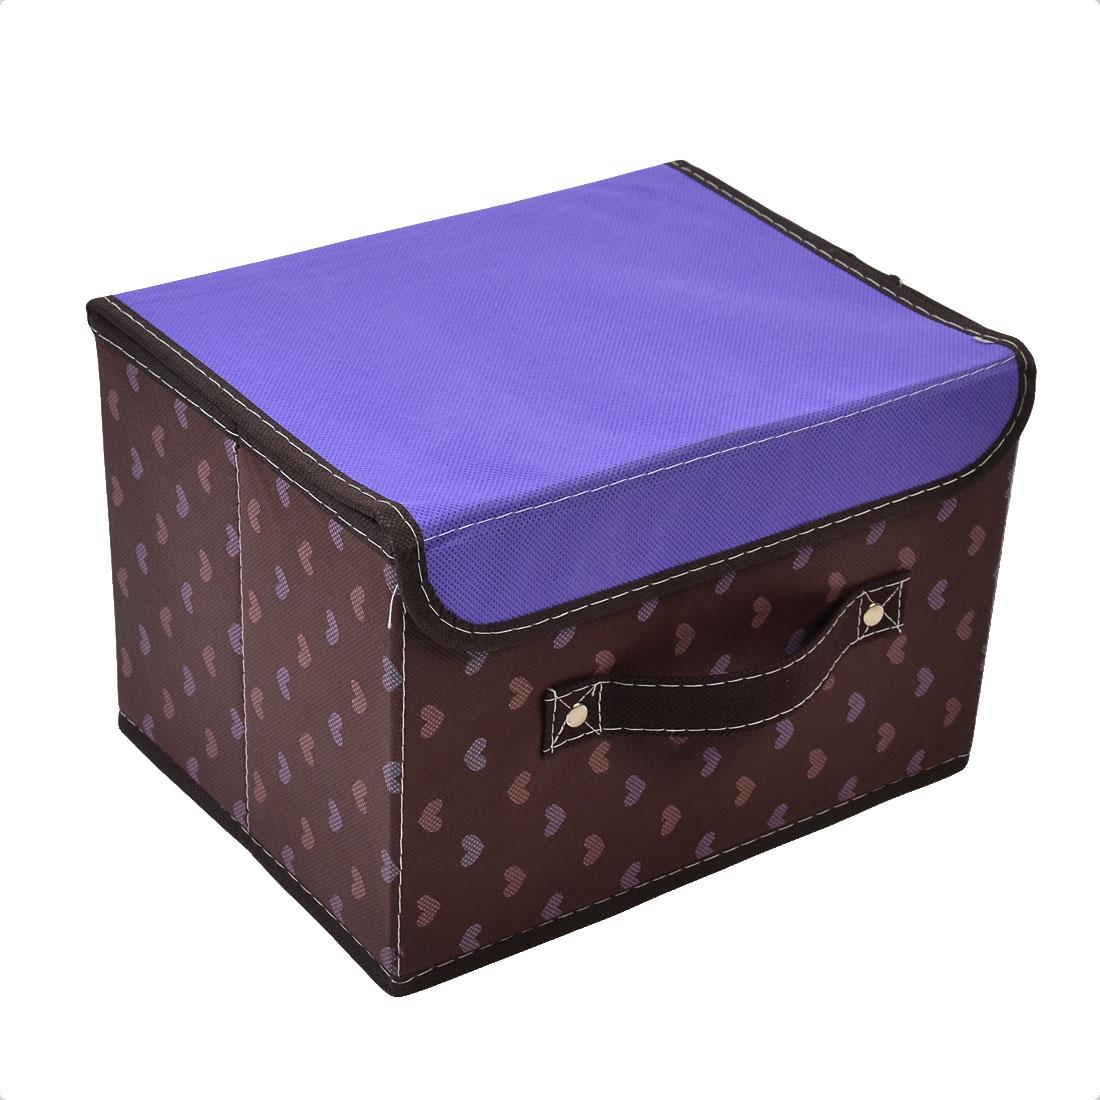 Non-woven Fabric Heart Pattern Carrying Strap Design Storage Box Purple Coffee Color